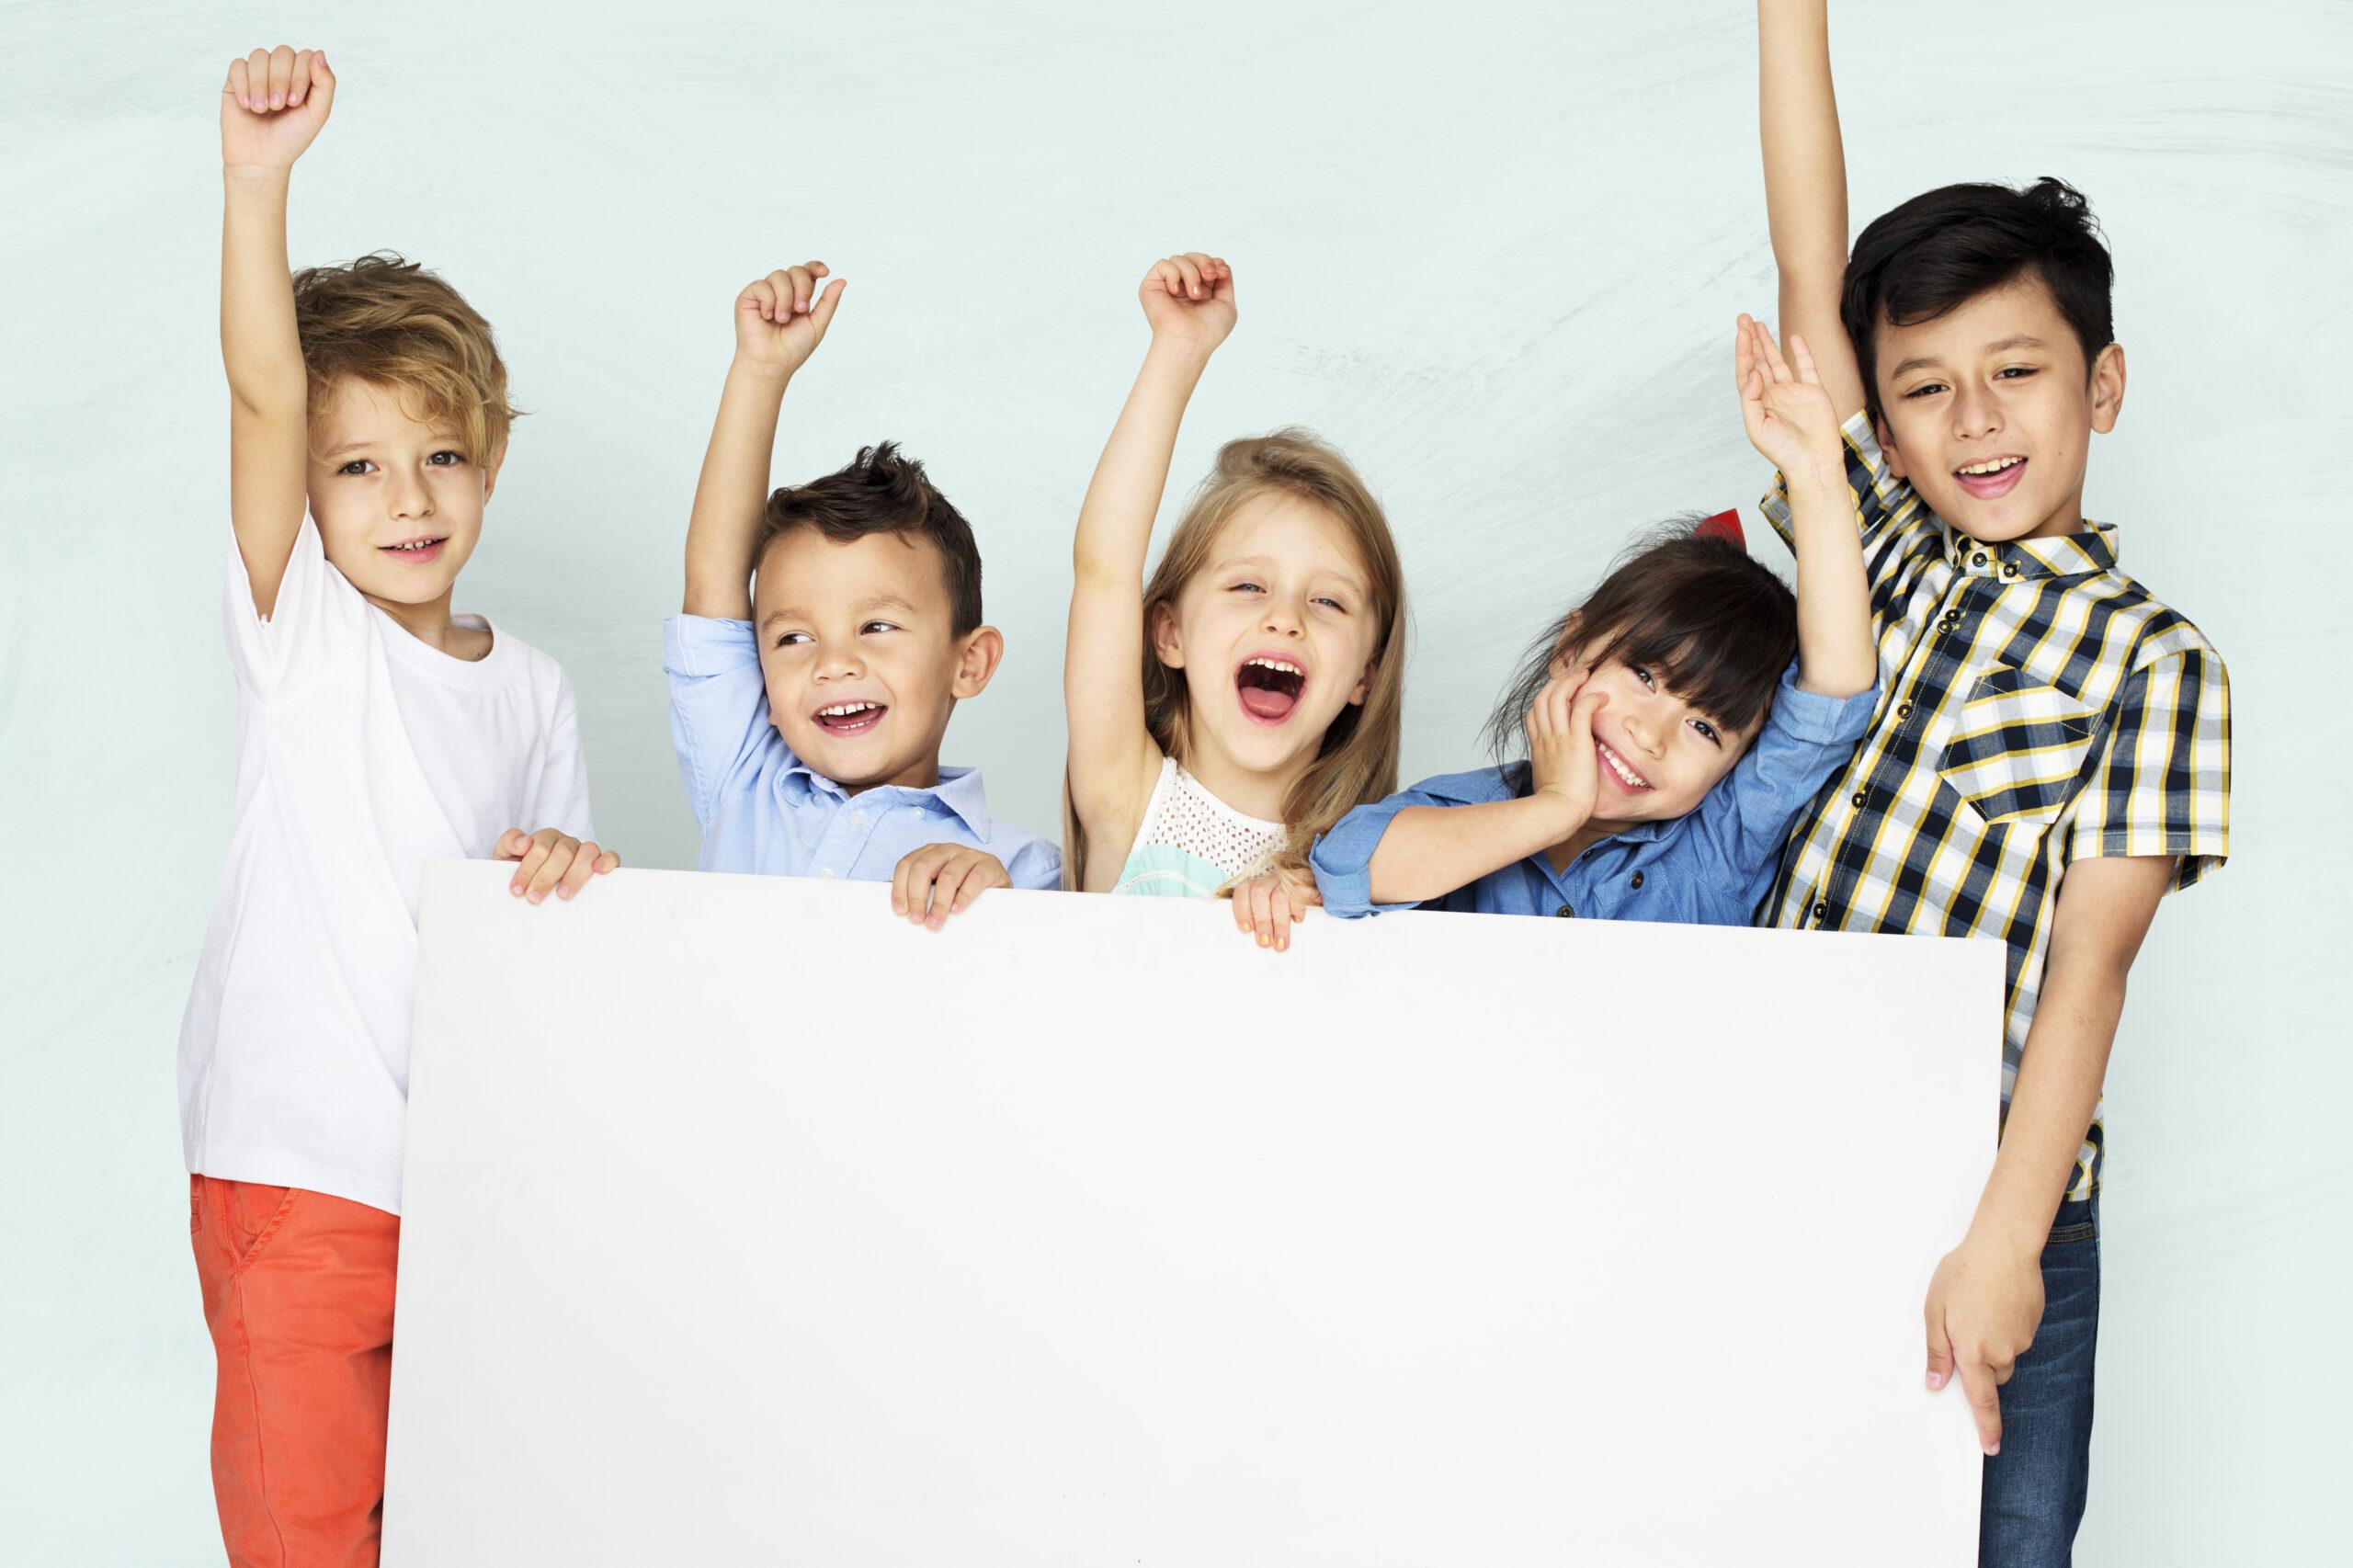 Congratulations to the 2021-22 Children's Health Fund Recipients